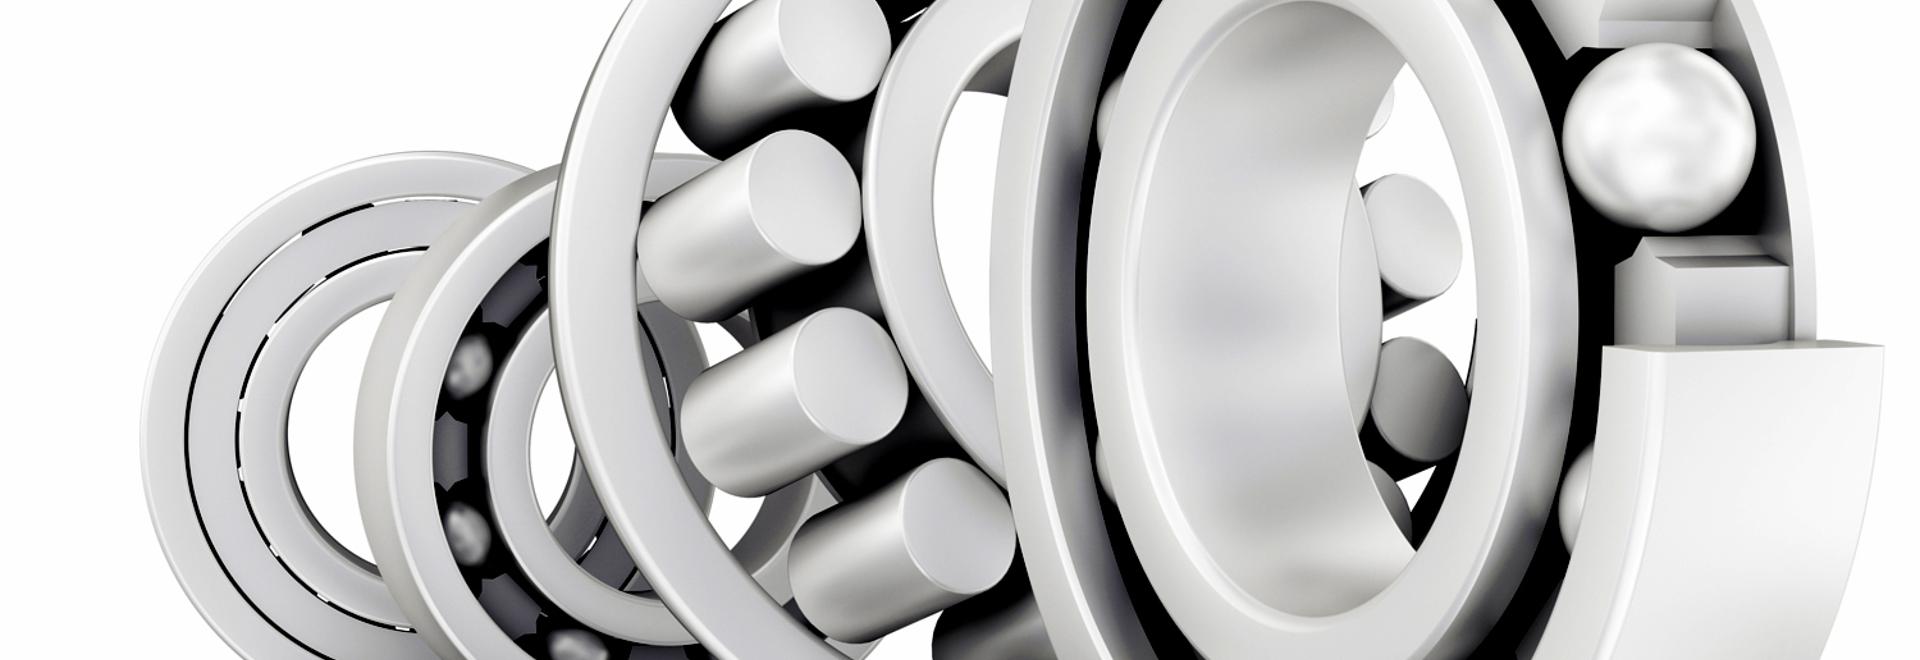 Zirconia Ceramic Radial Ball Bearings.